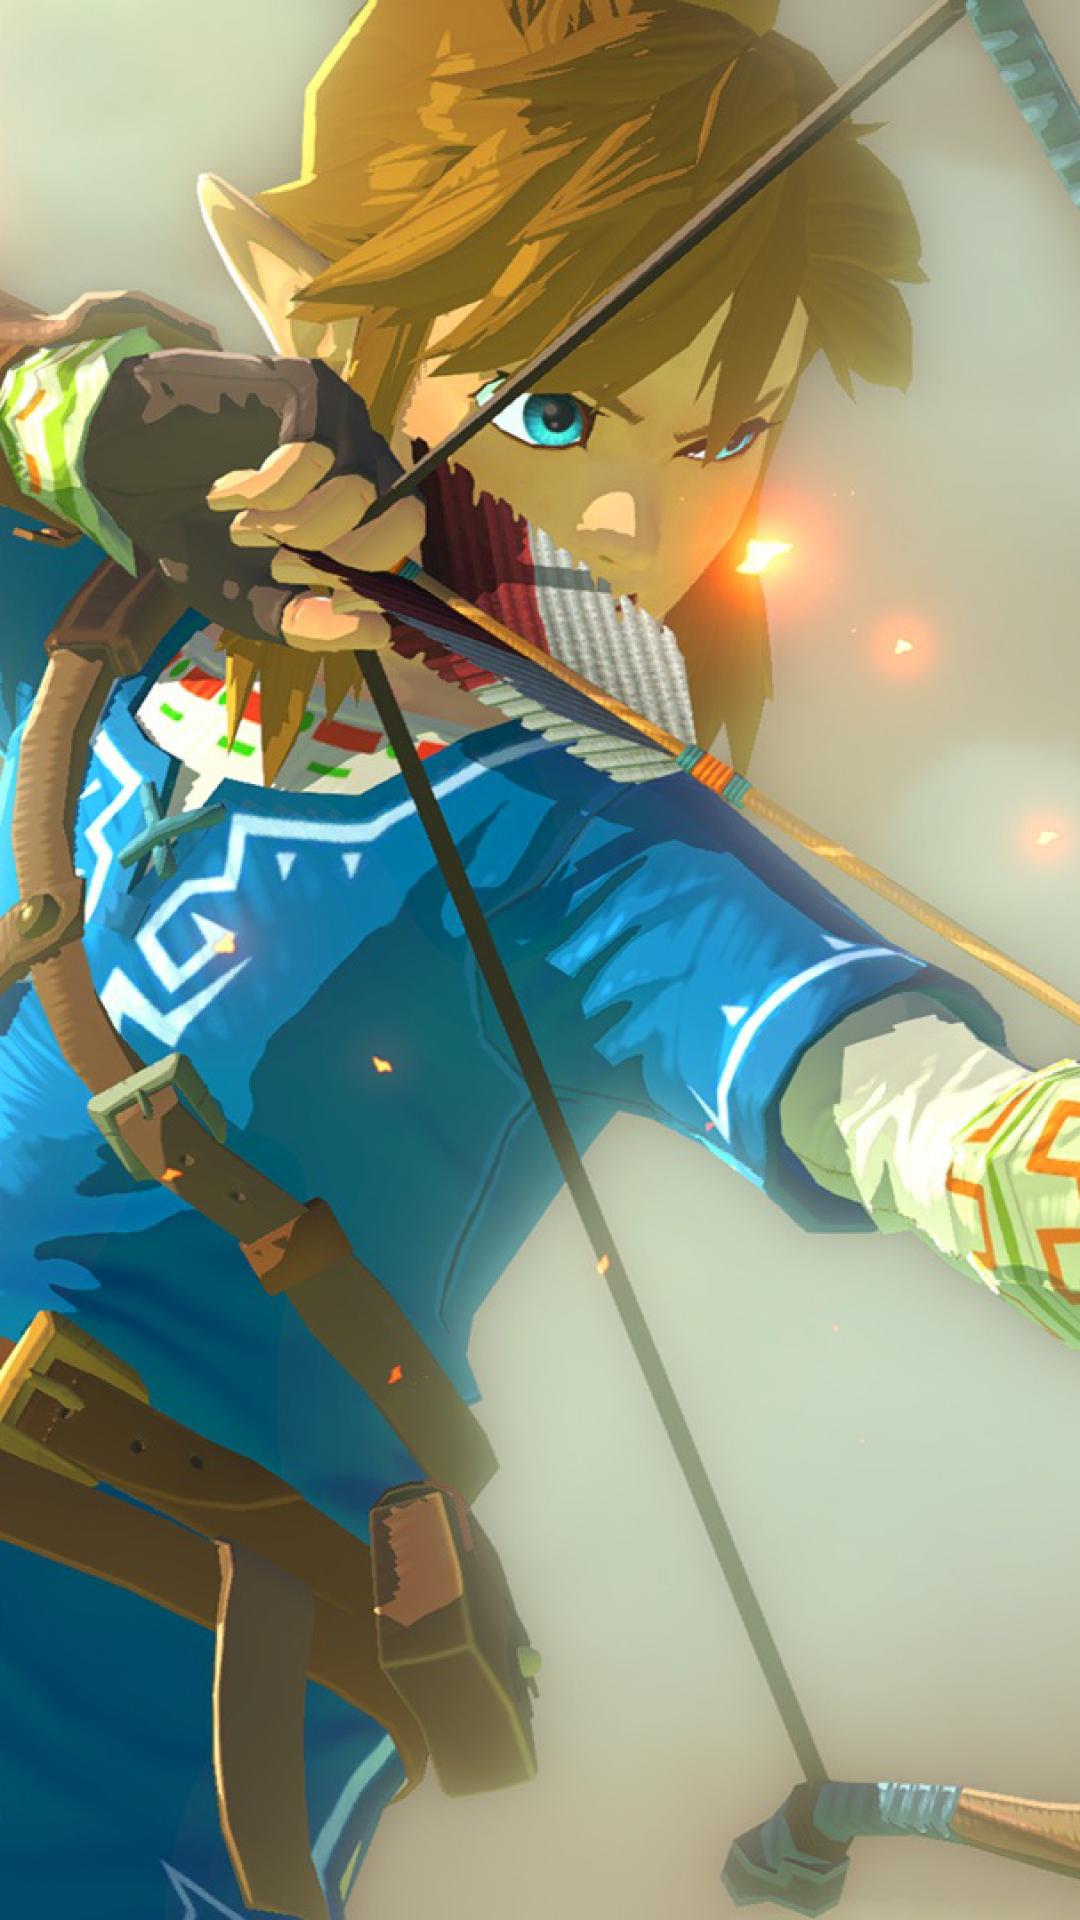 Zelda Iphone Image Free Download - Botw Link X Male Reader ...